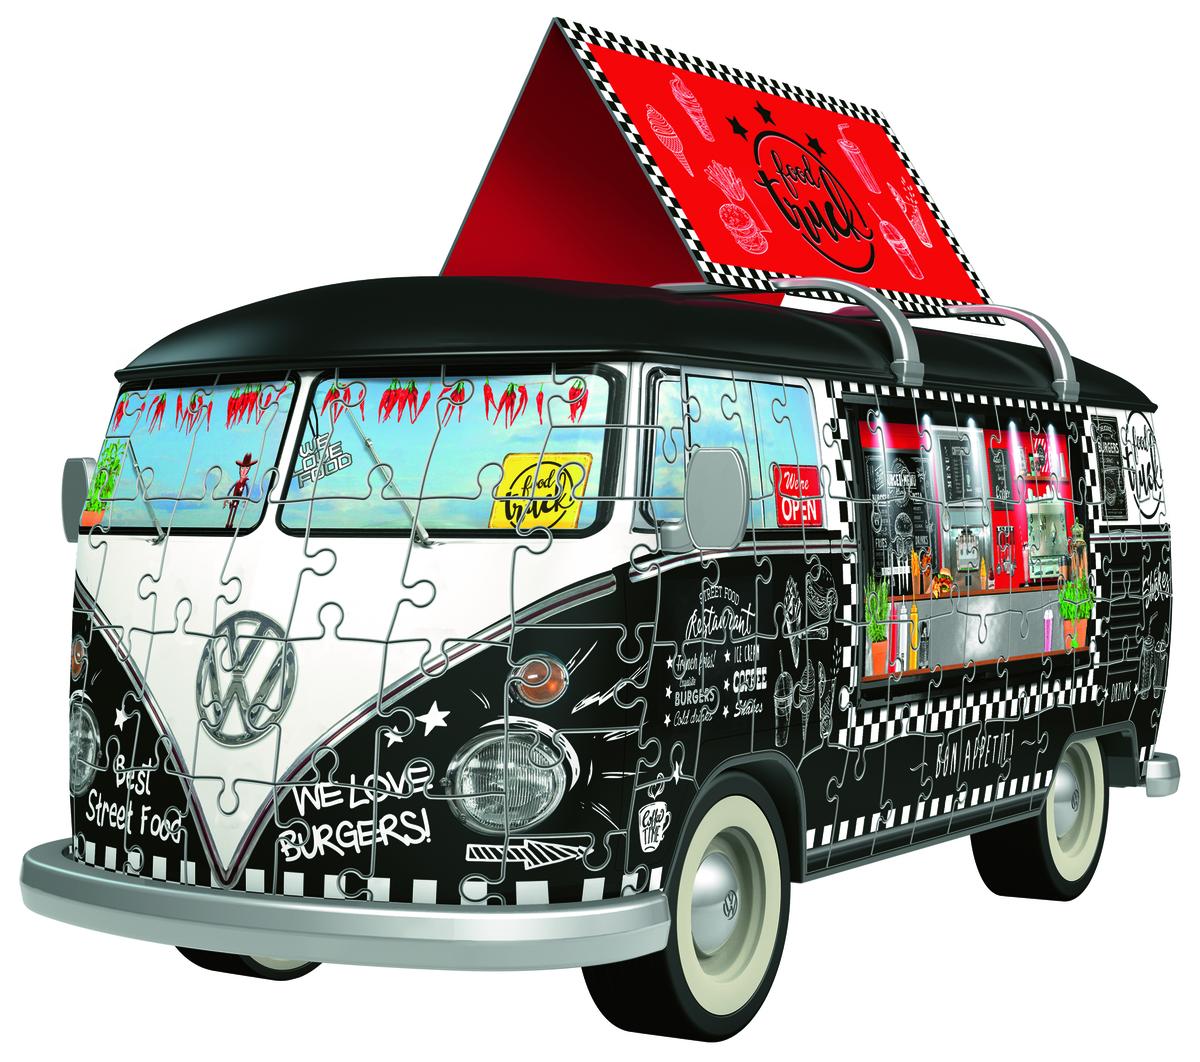 Bild 1 von Ravensburger 12525 VW T1 Food Truck,3D Puzzle